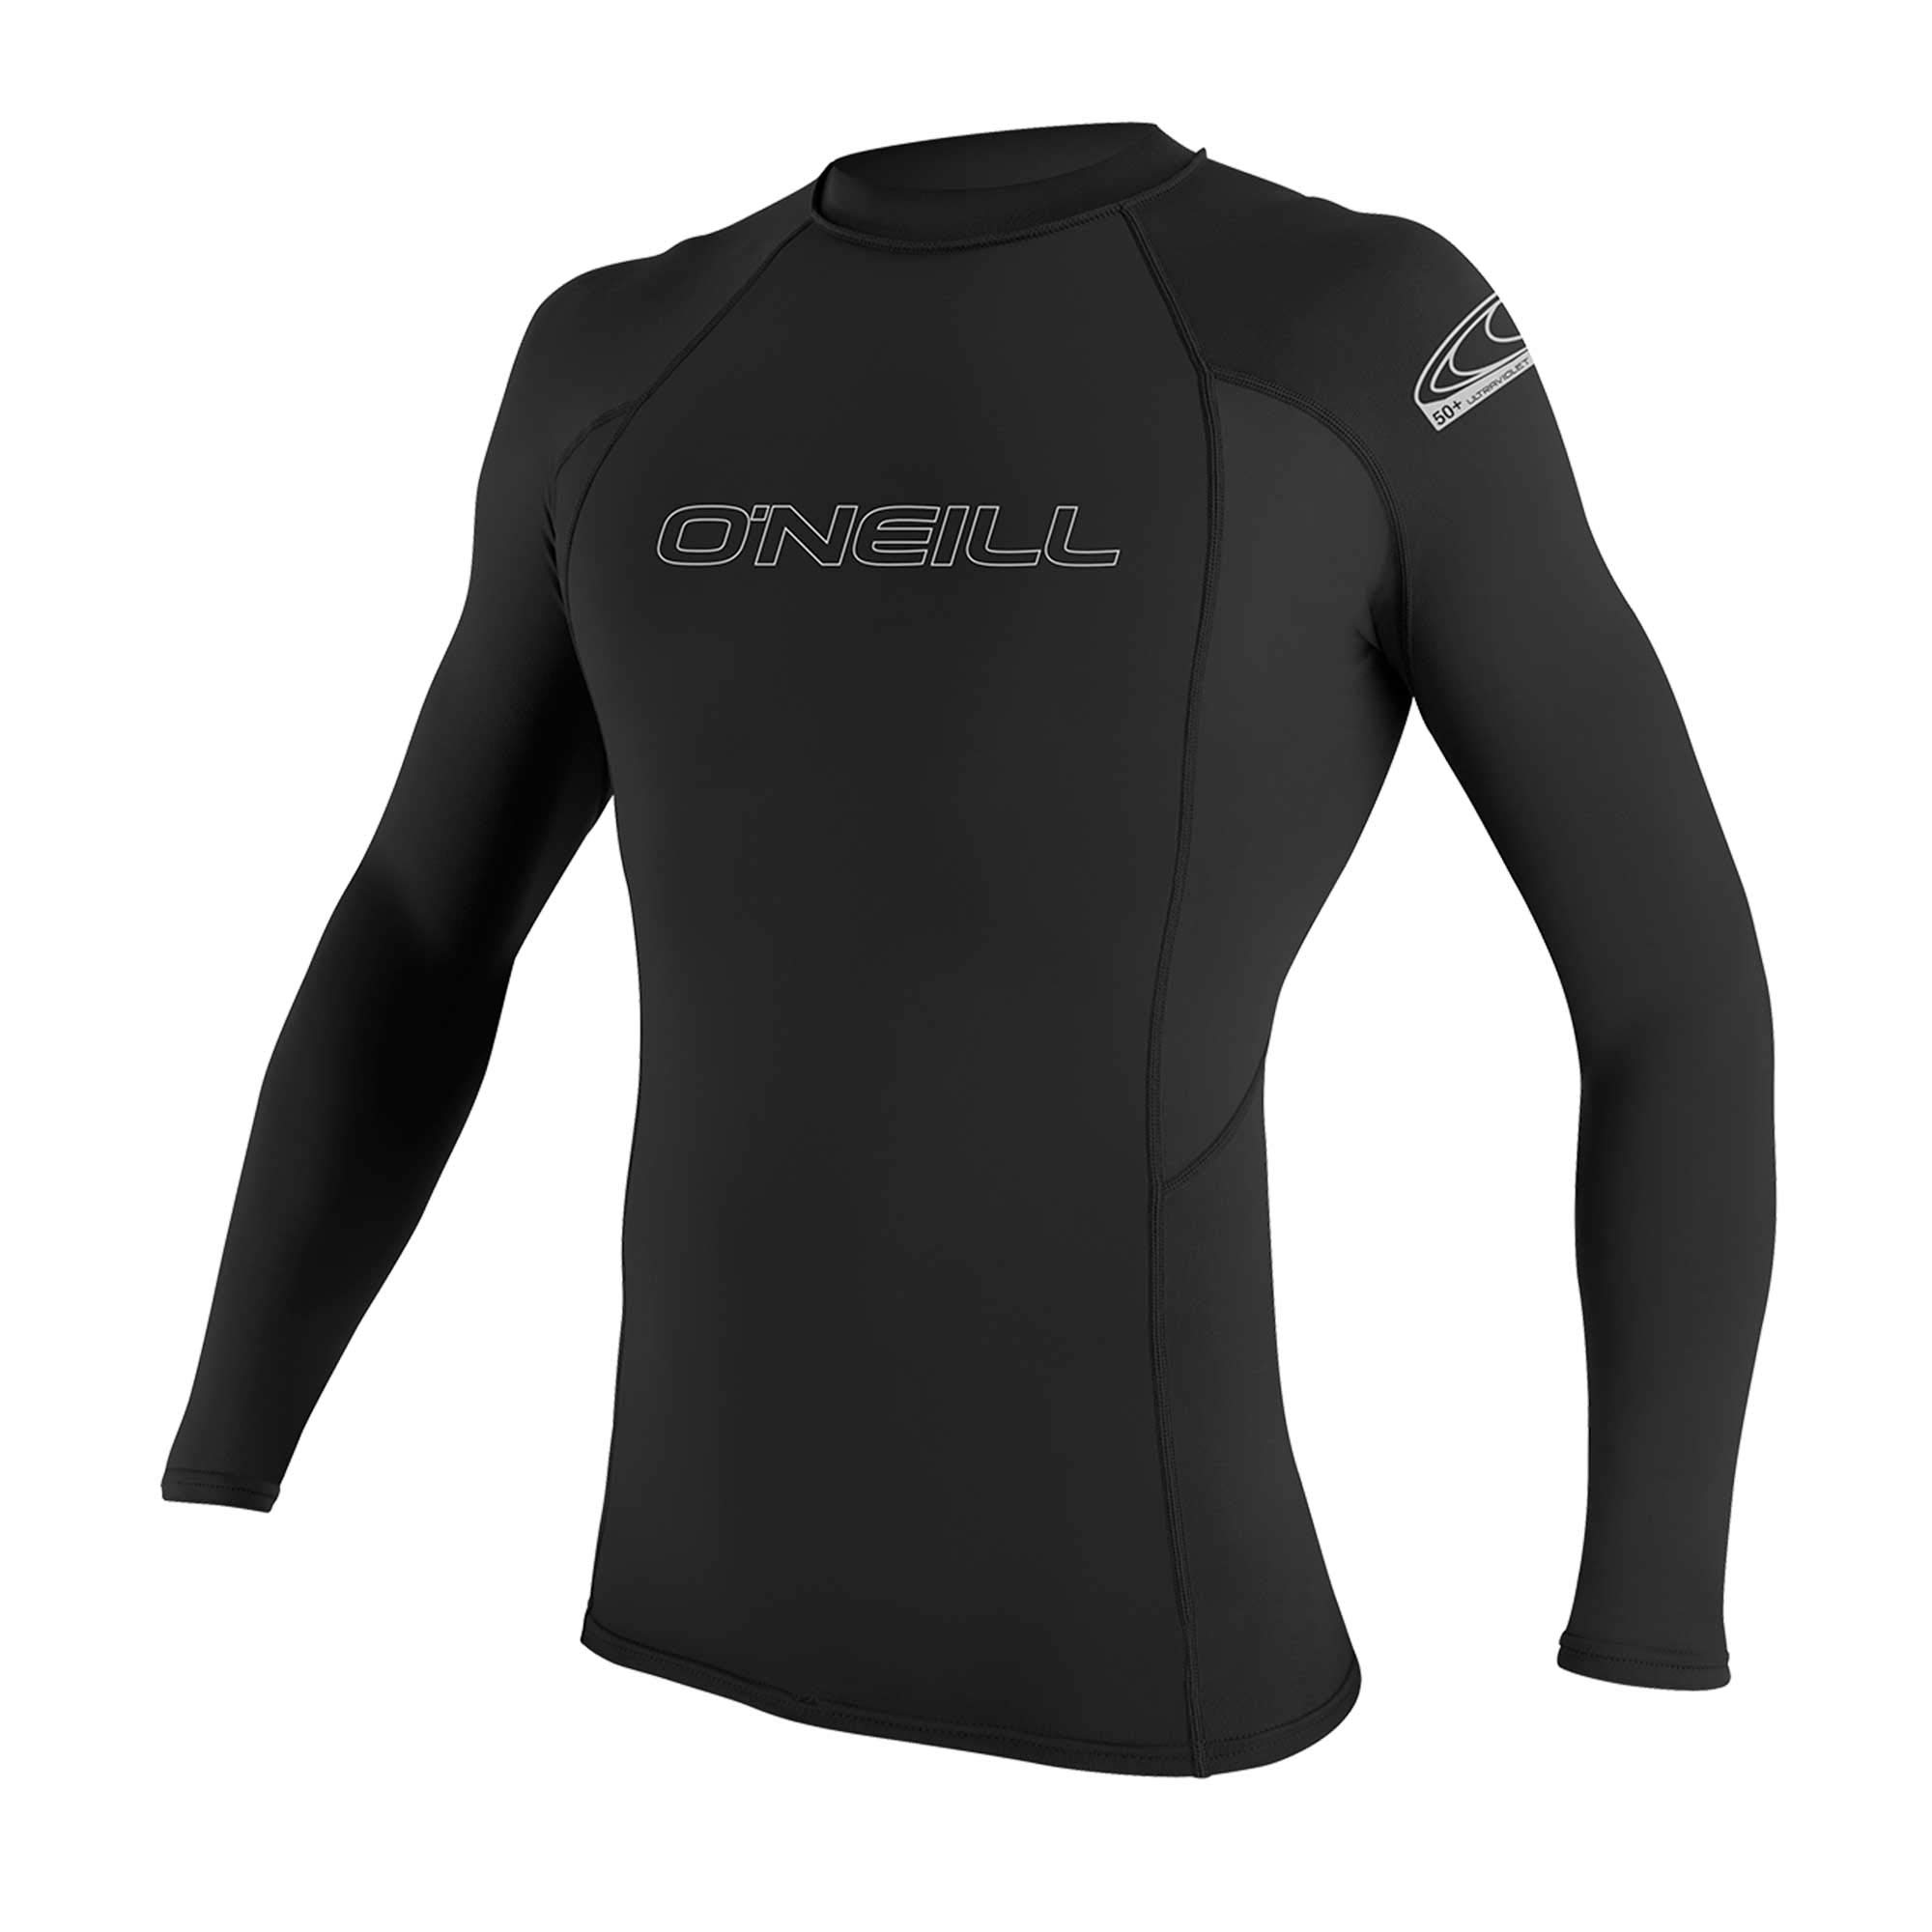 O'Neill Men's Basic Skins UPF 50+ Long Sleeve Rash Guard, Black, Large by O'Neill Wetsuits